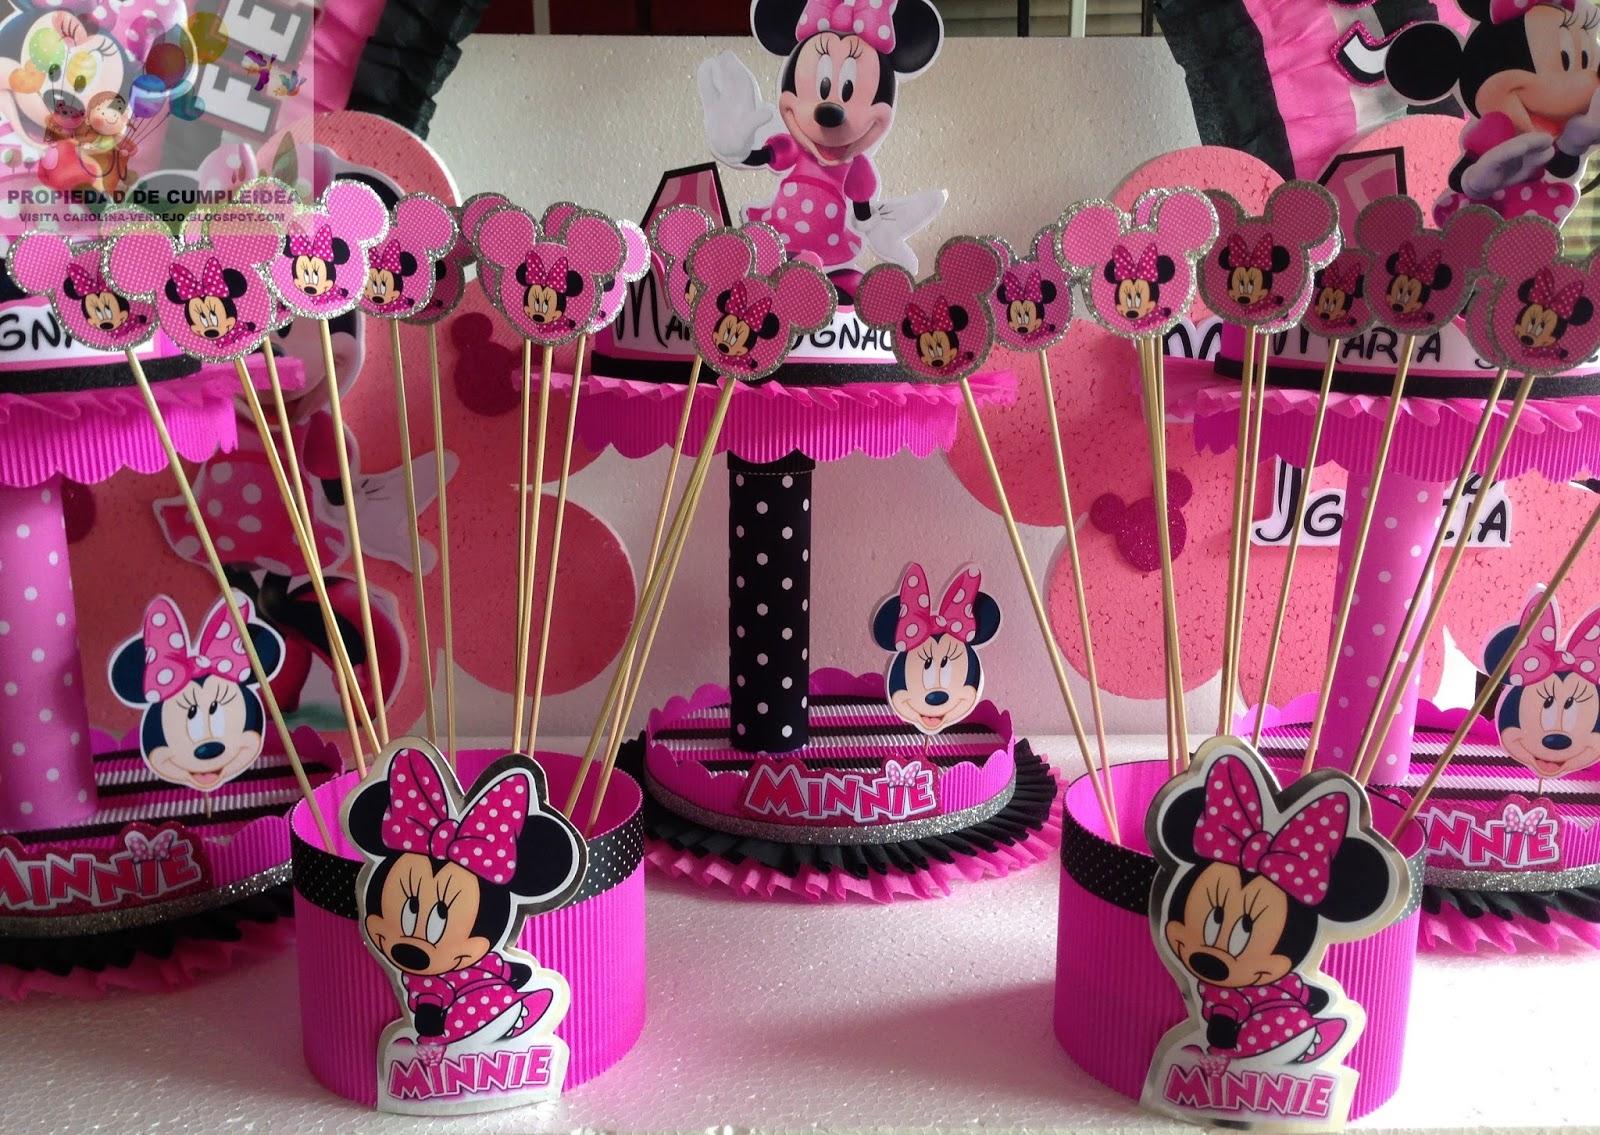 Minnie Decoraciones Fiestas Infantiles ~ Decoraciones De Minnie Mouse Para Fiestas Infantiles Minnie mouse